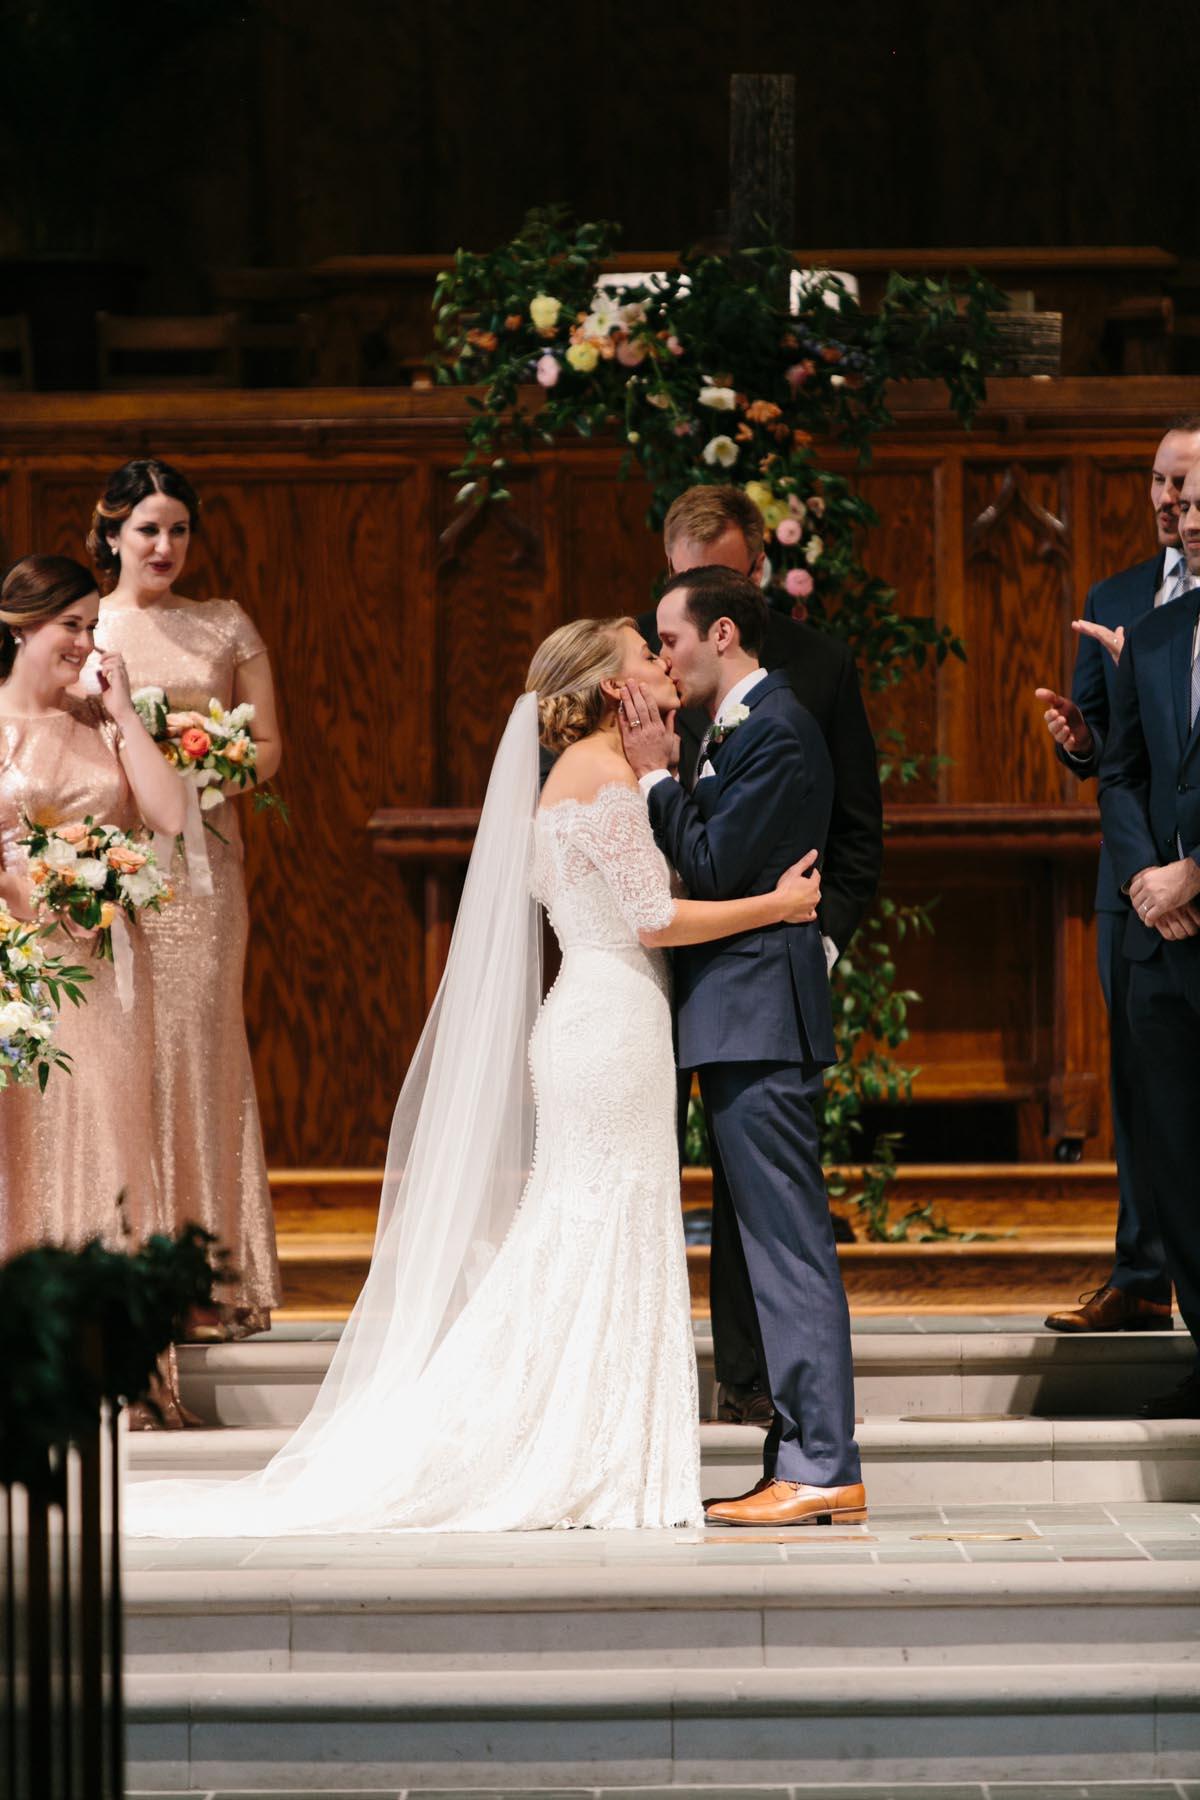 kjellman wedding blog biltmore wedding -84